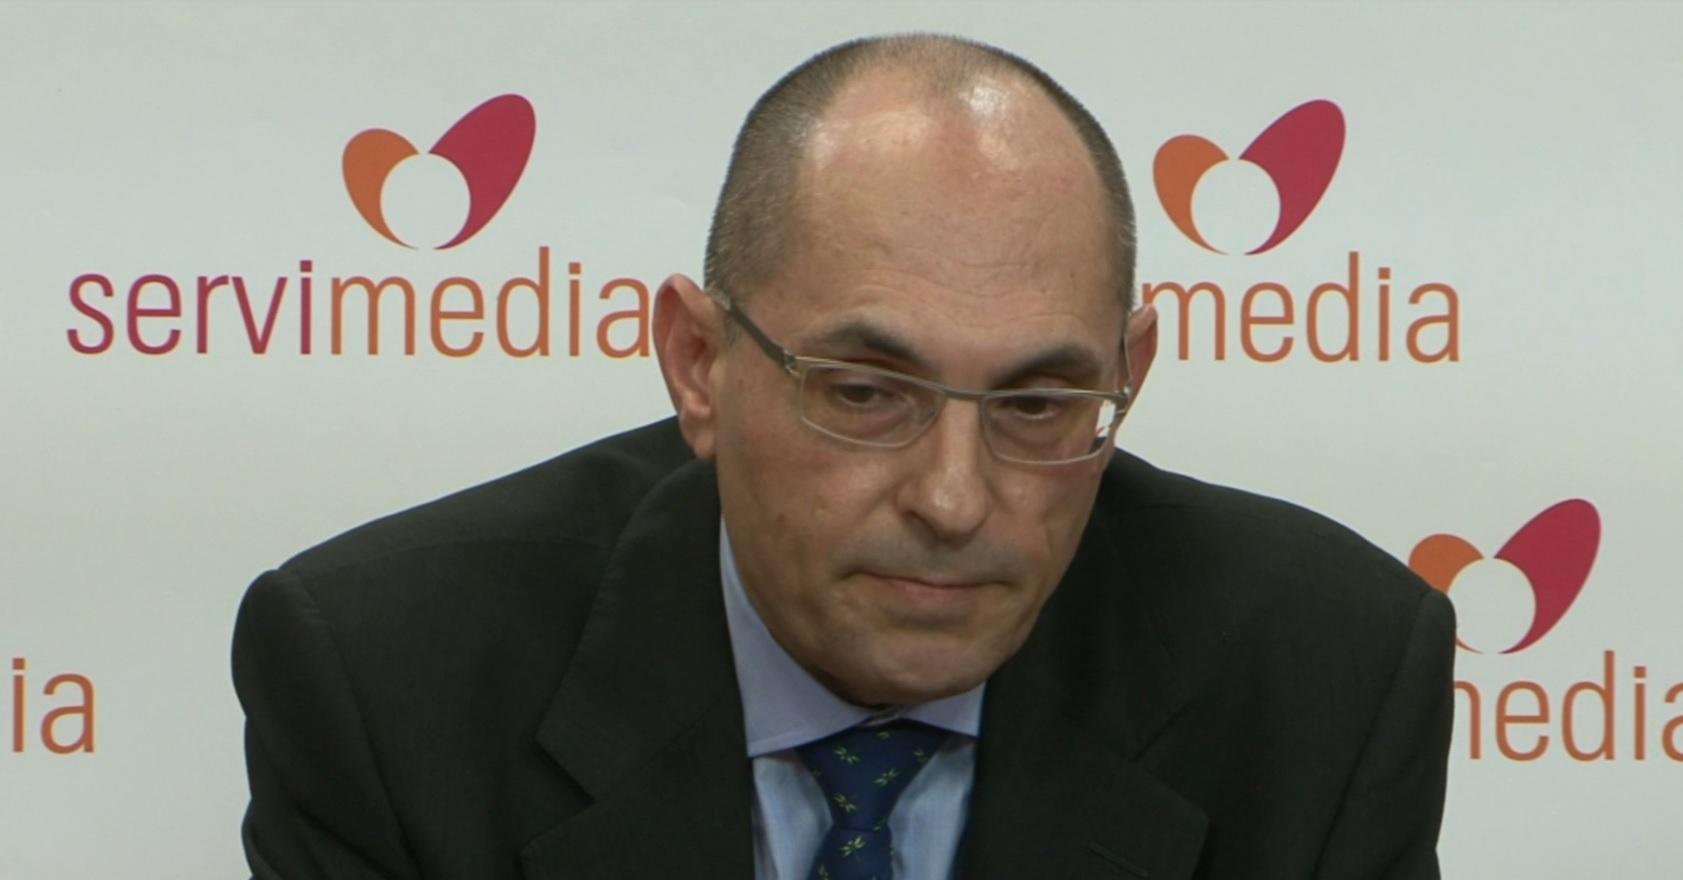 Los correos de Blesa volverán a ser válidos si un juez se atreve a pedirlos a Bankia